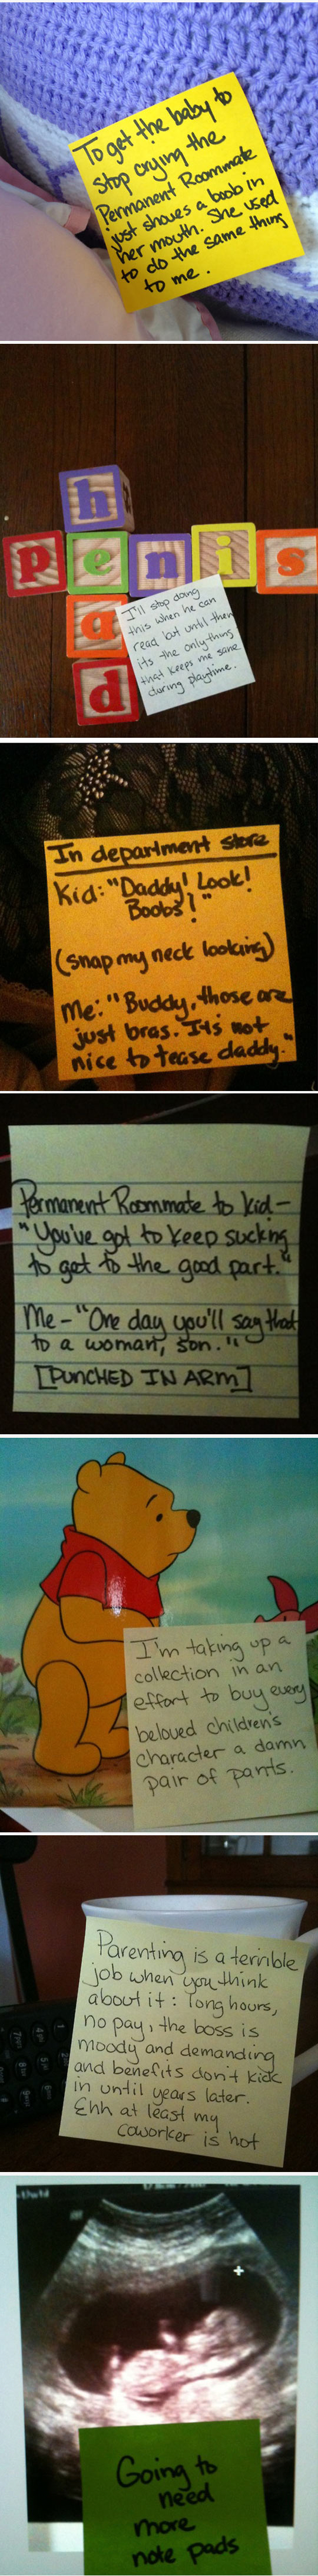 funny-Postit-notes-dad